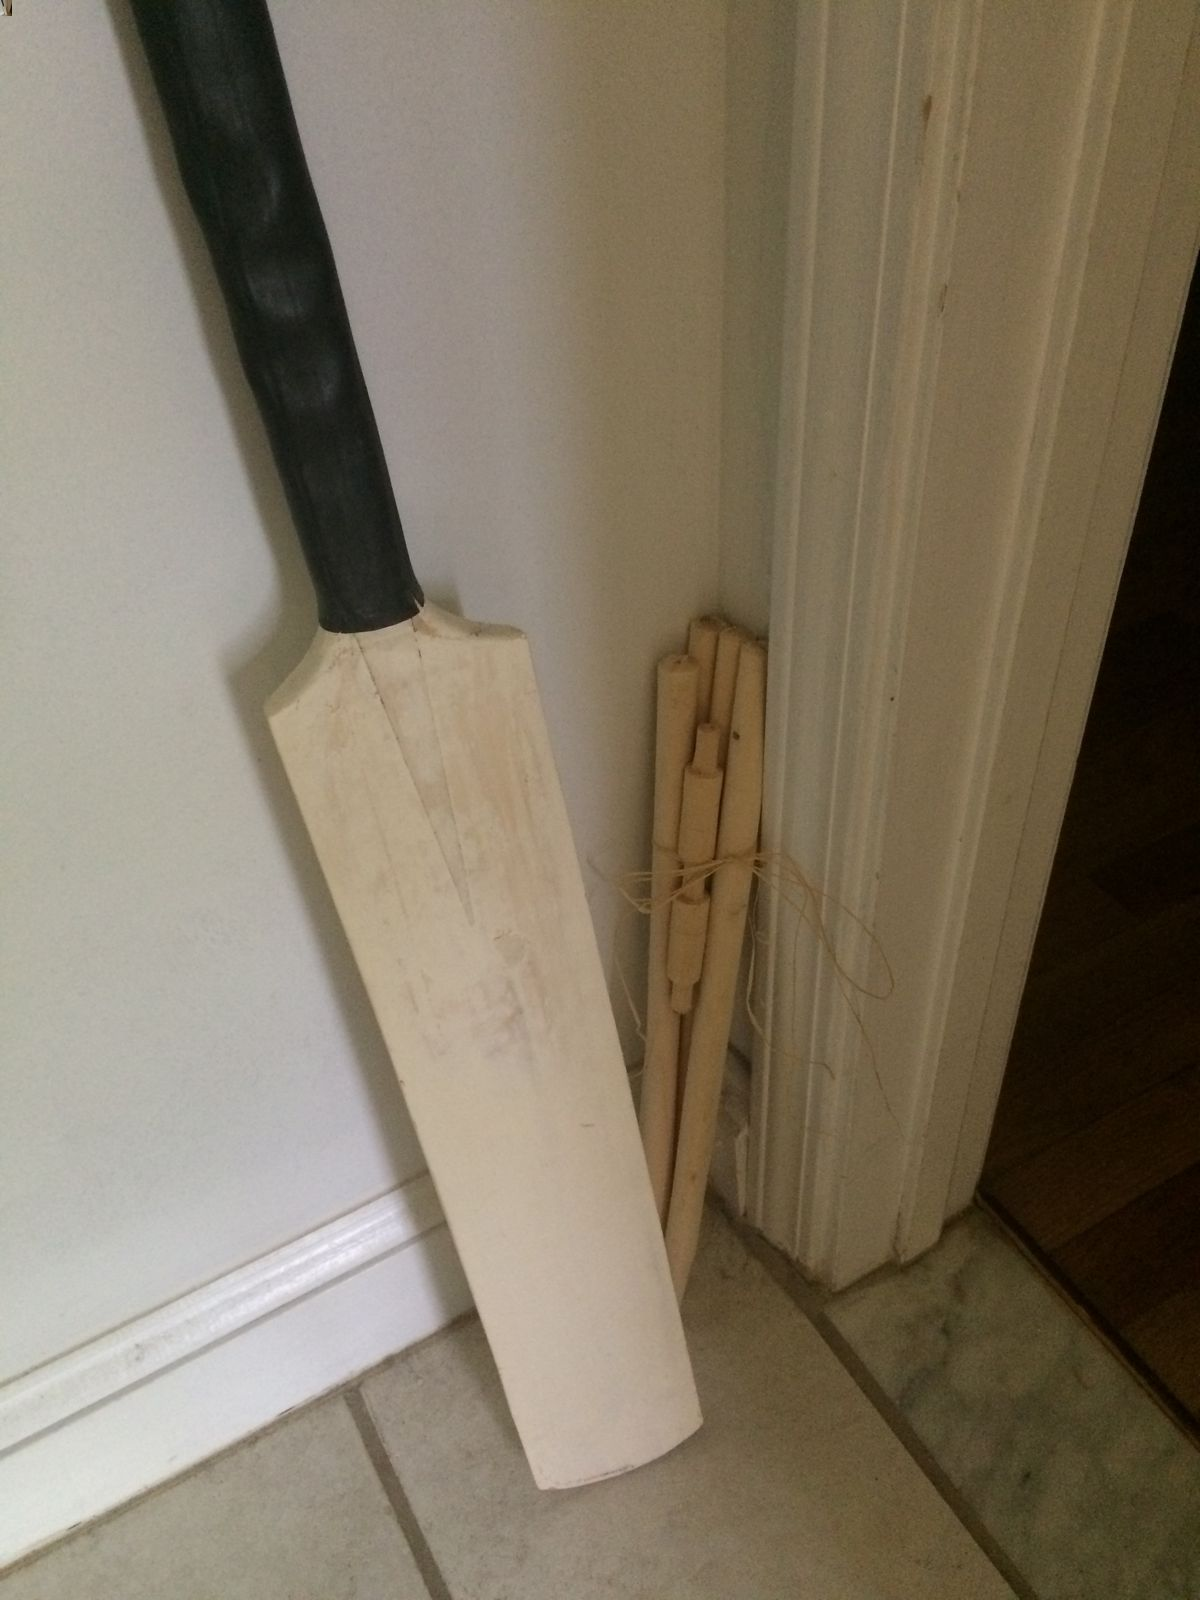 Cricket, just cricket!